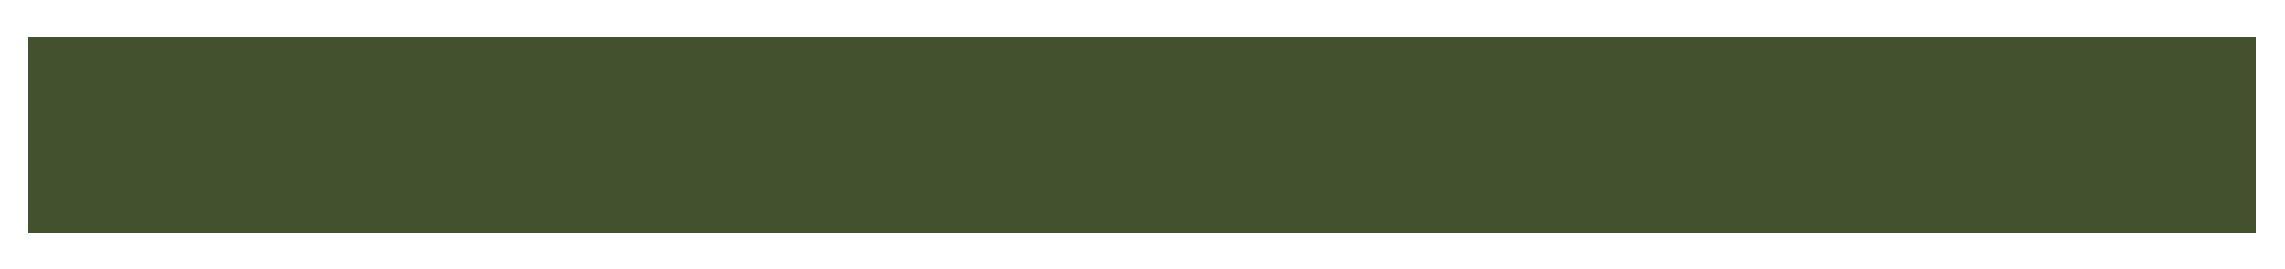 Vogue Grange logo